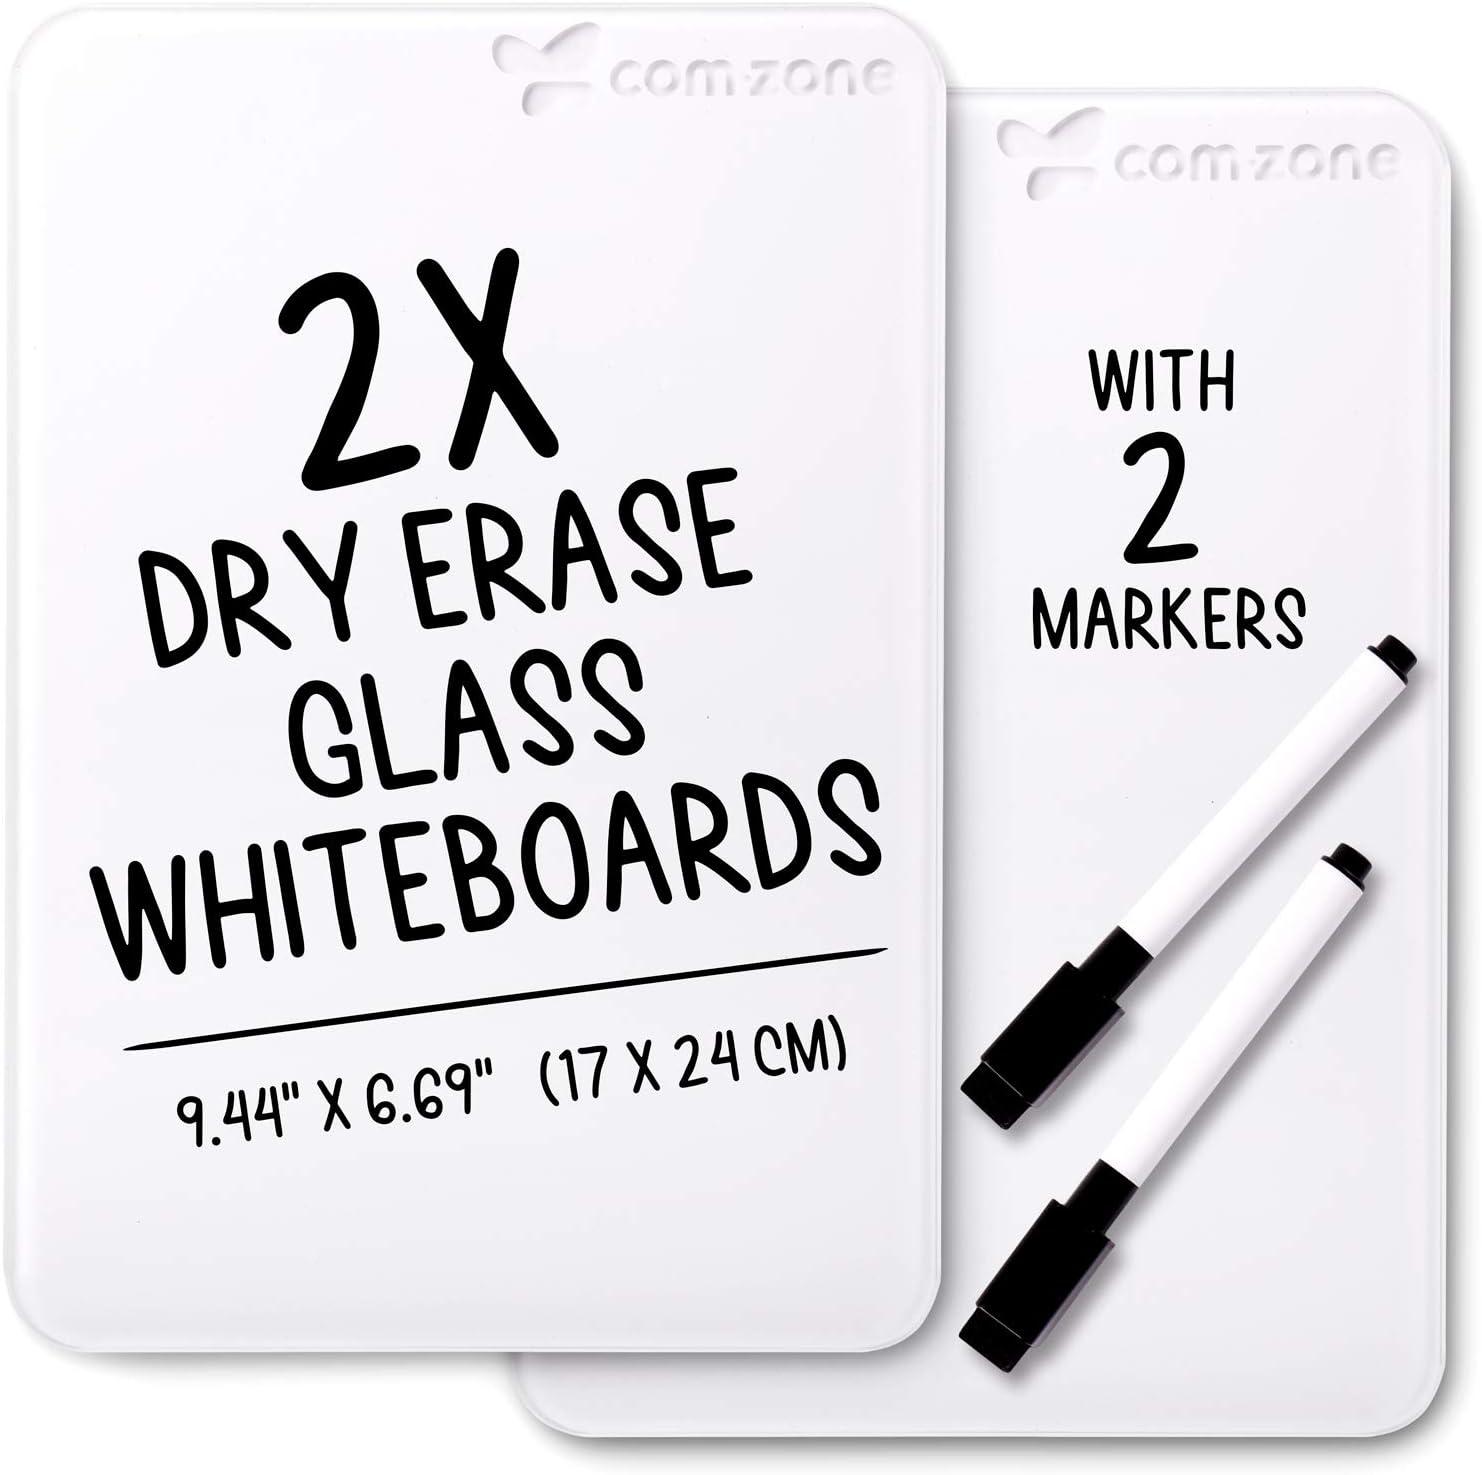 Dry Erase Glass Desktop Notepad, 9.44